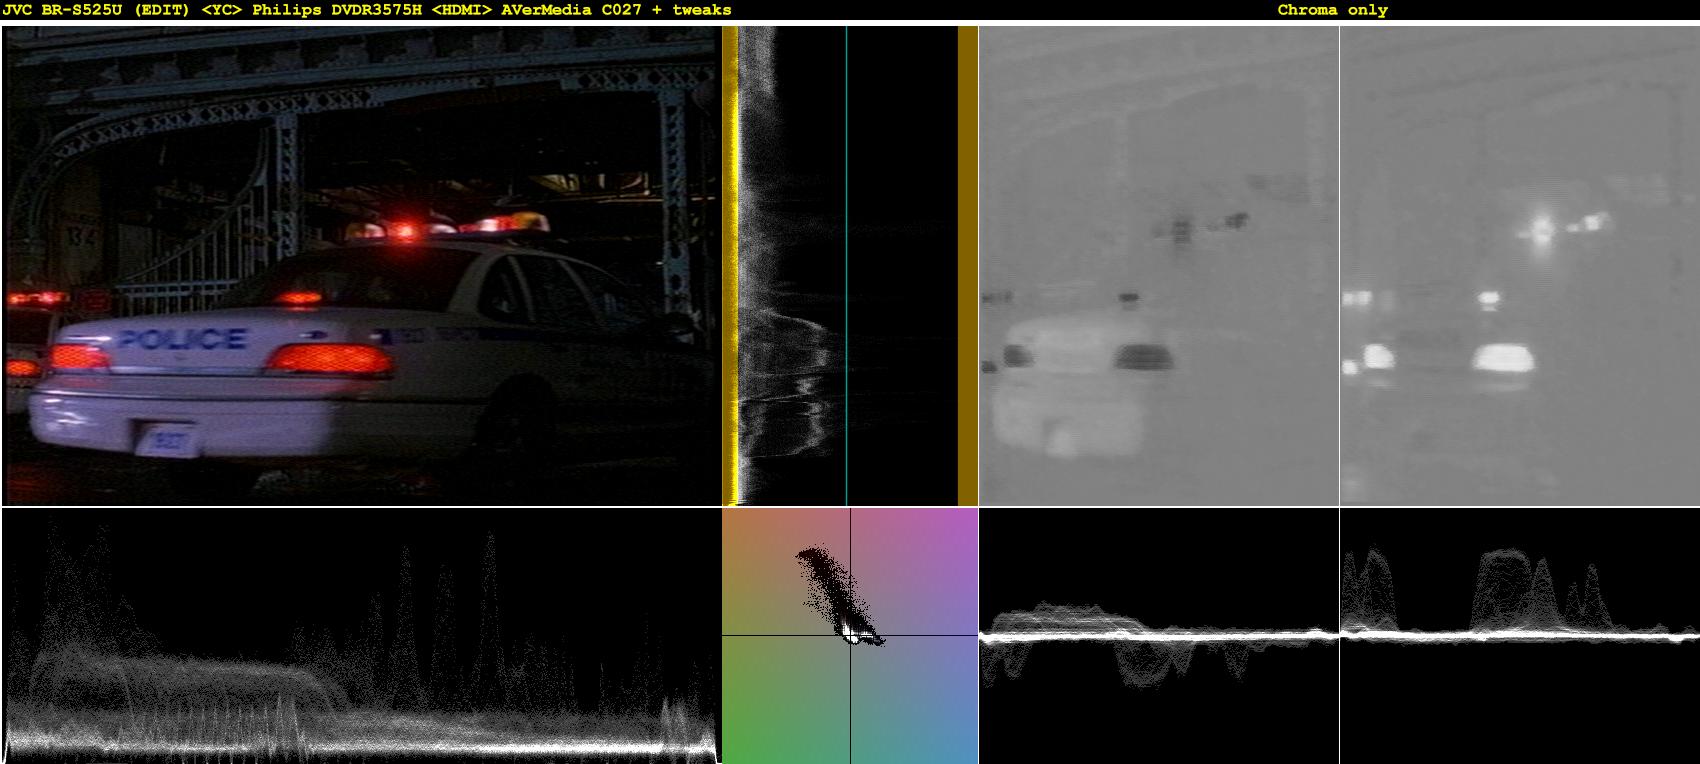 Click image for larger version  Name:0-55-31 - JVC BR-S525U (EDIT).png Views:1375 Size:862.7 KB ID:37676